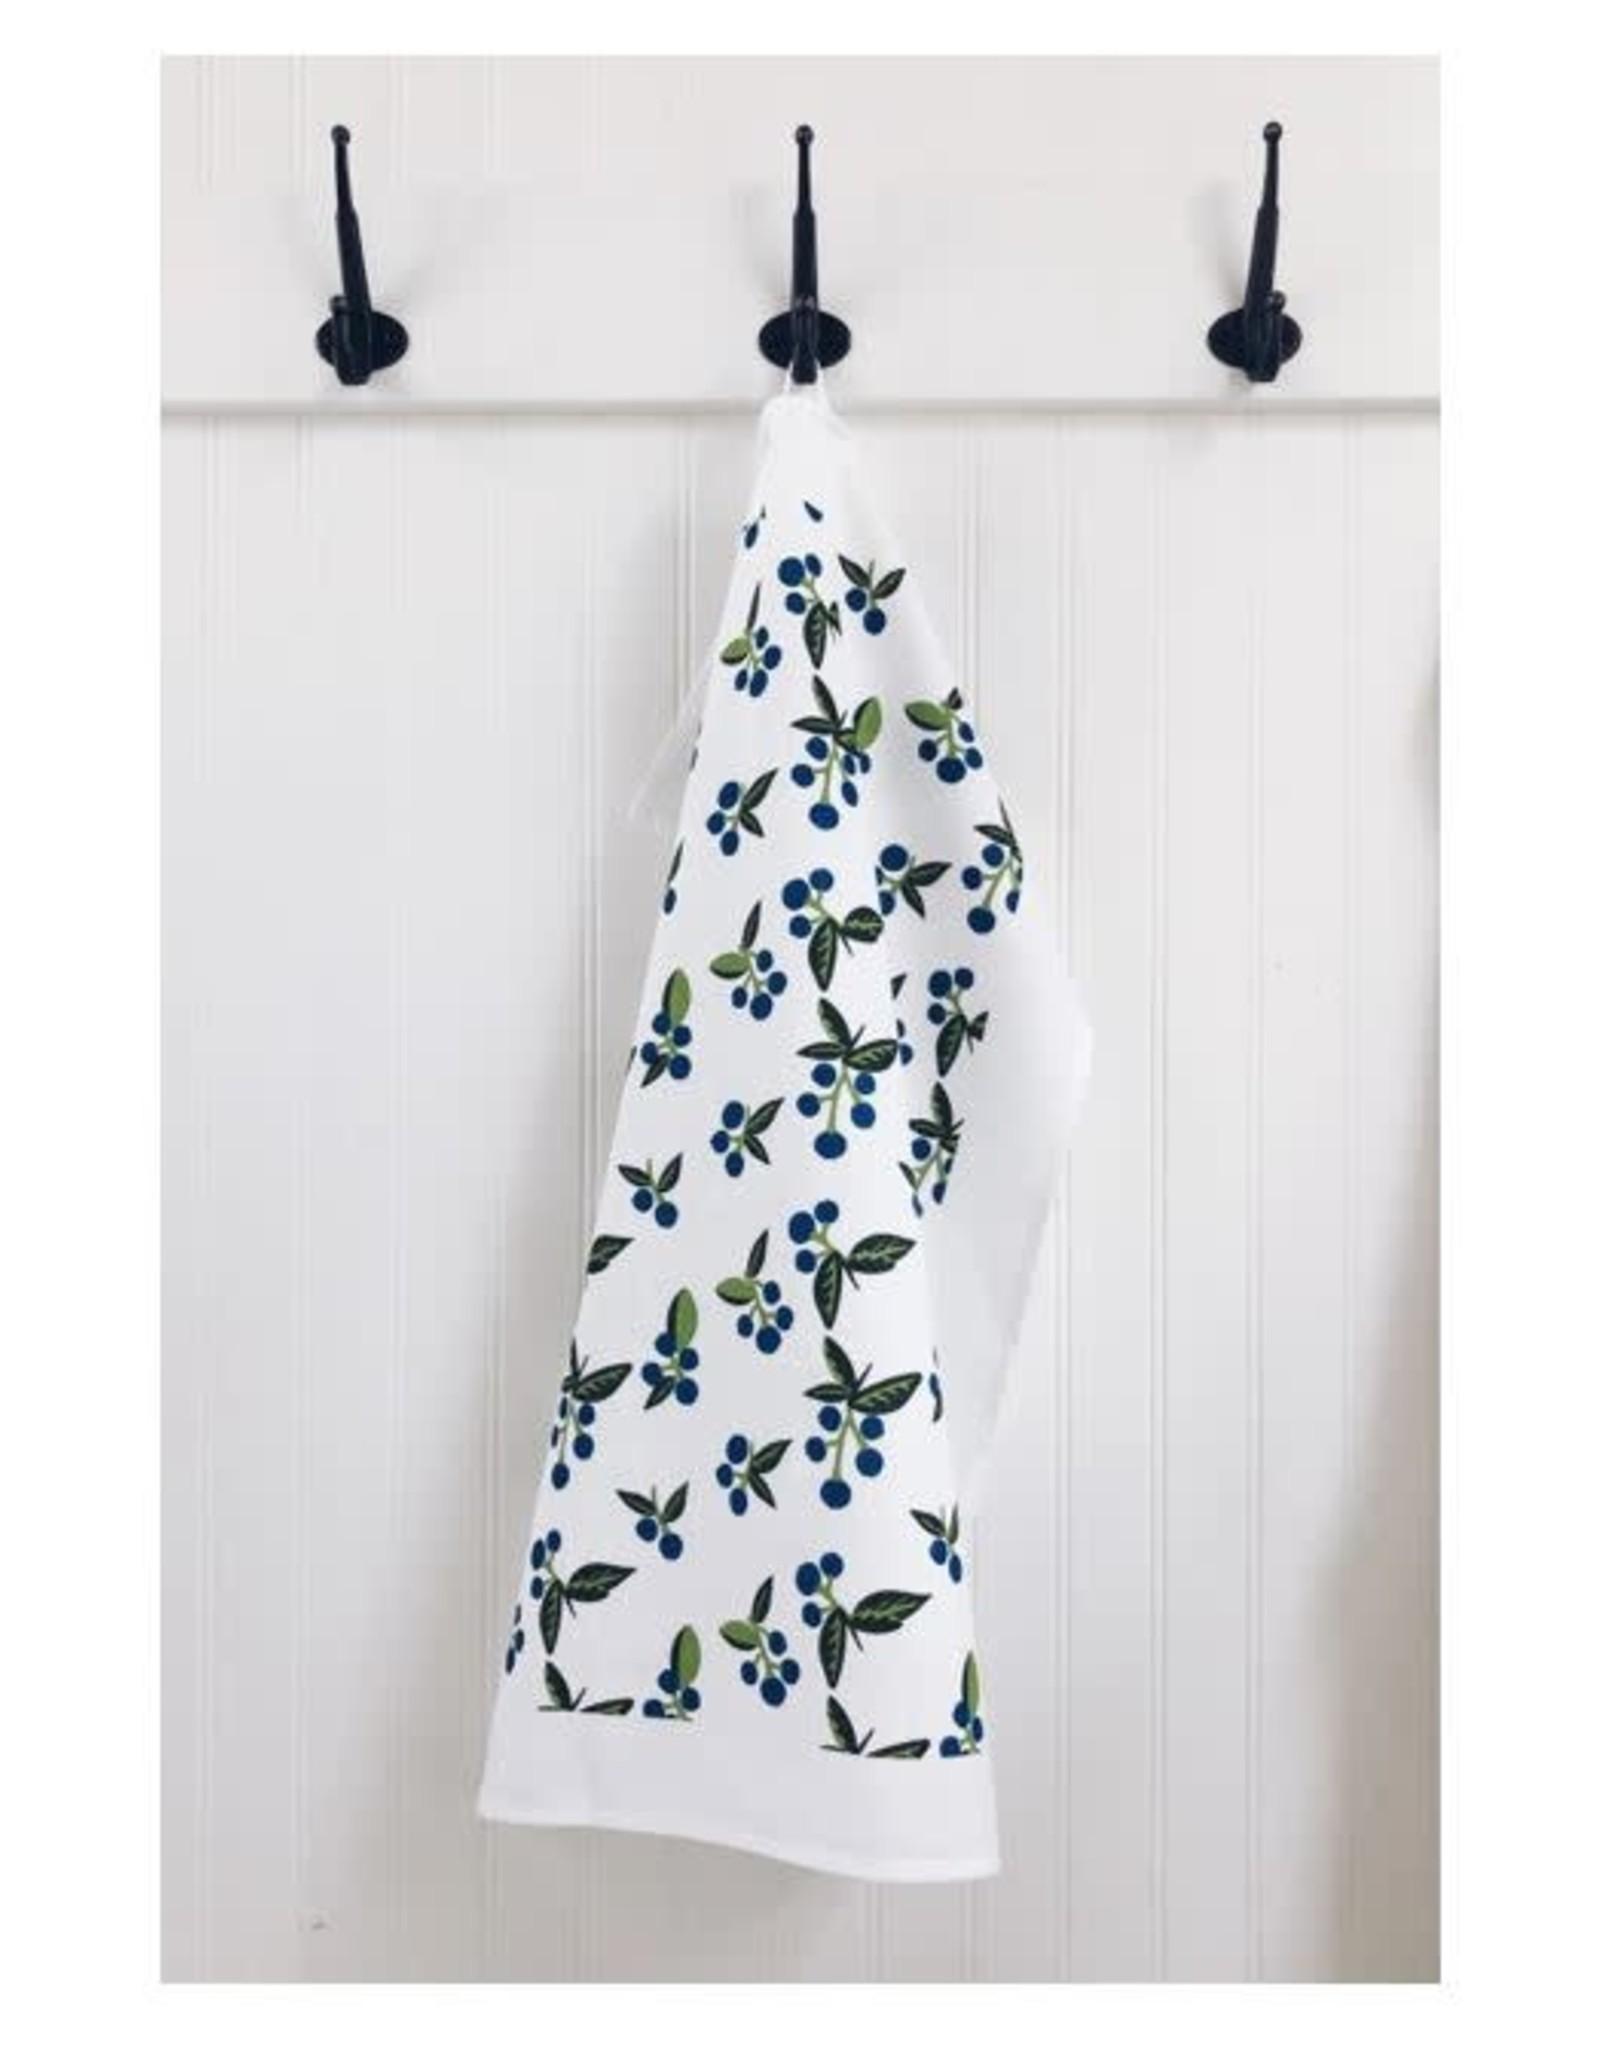 Ten and Co. Tea Towel - Wild Bluberry